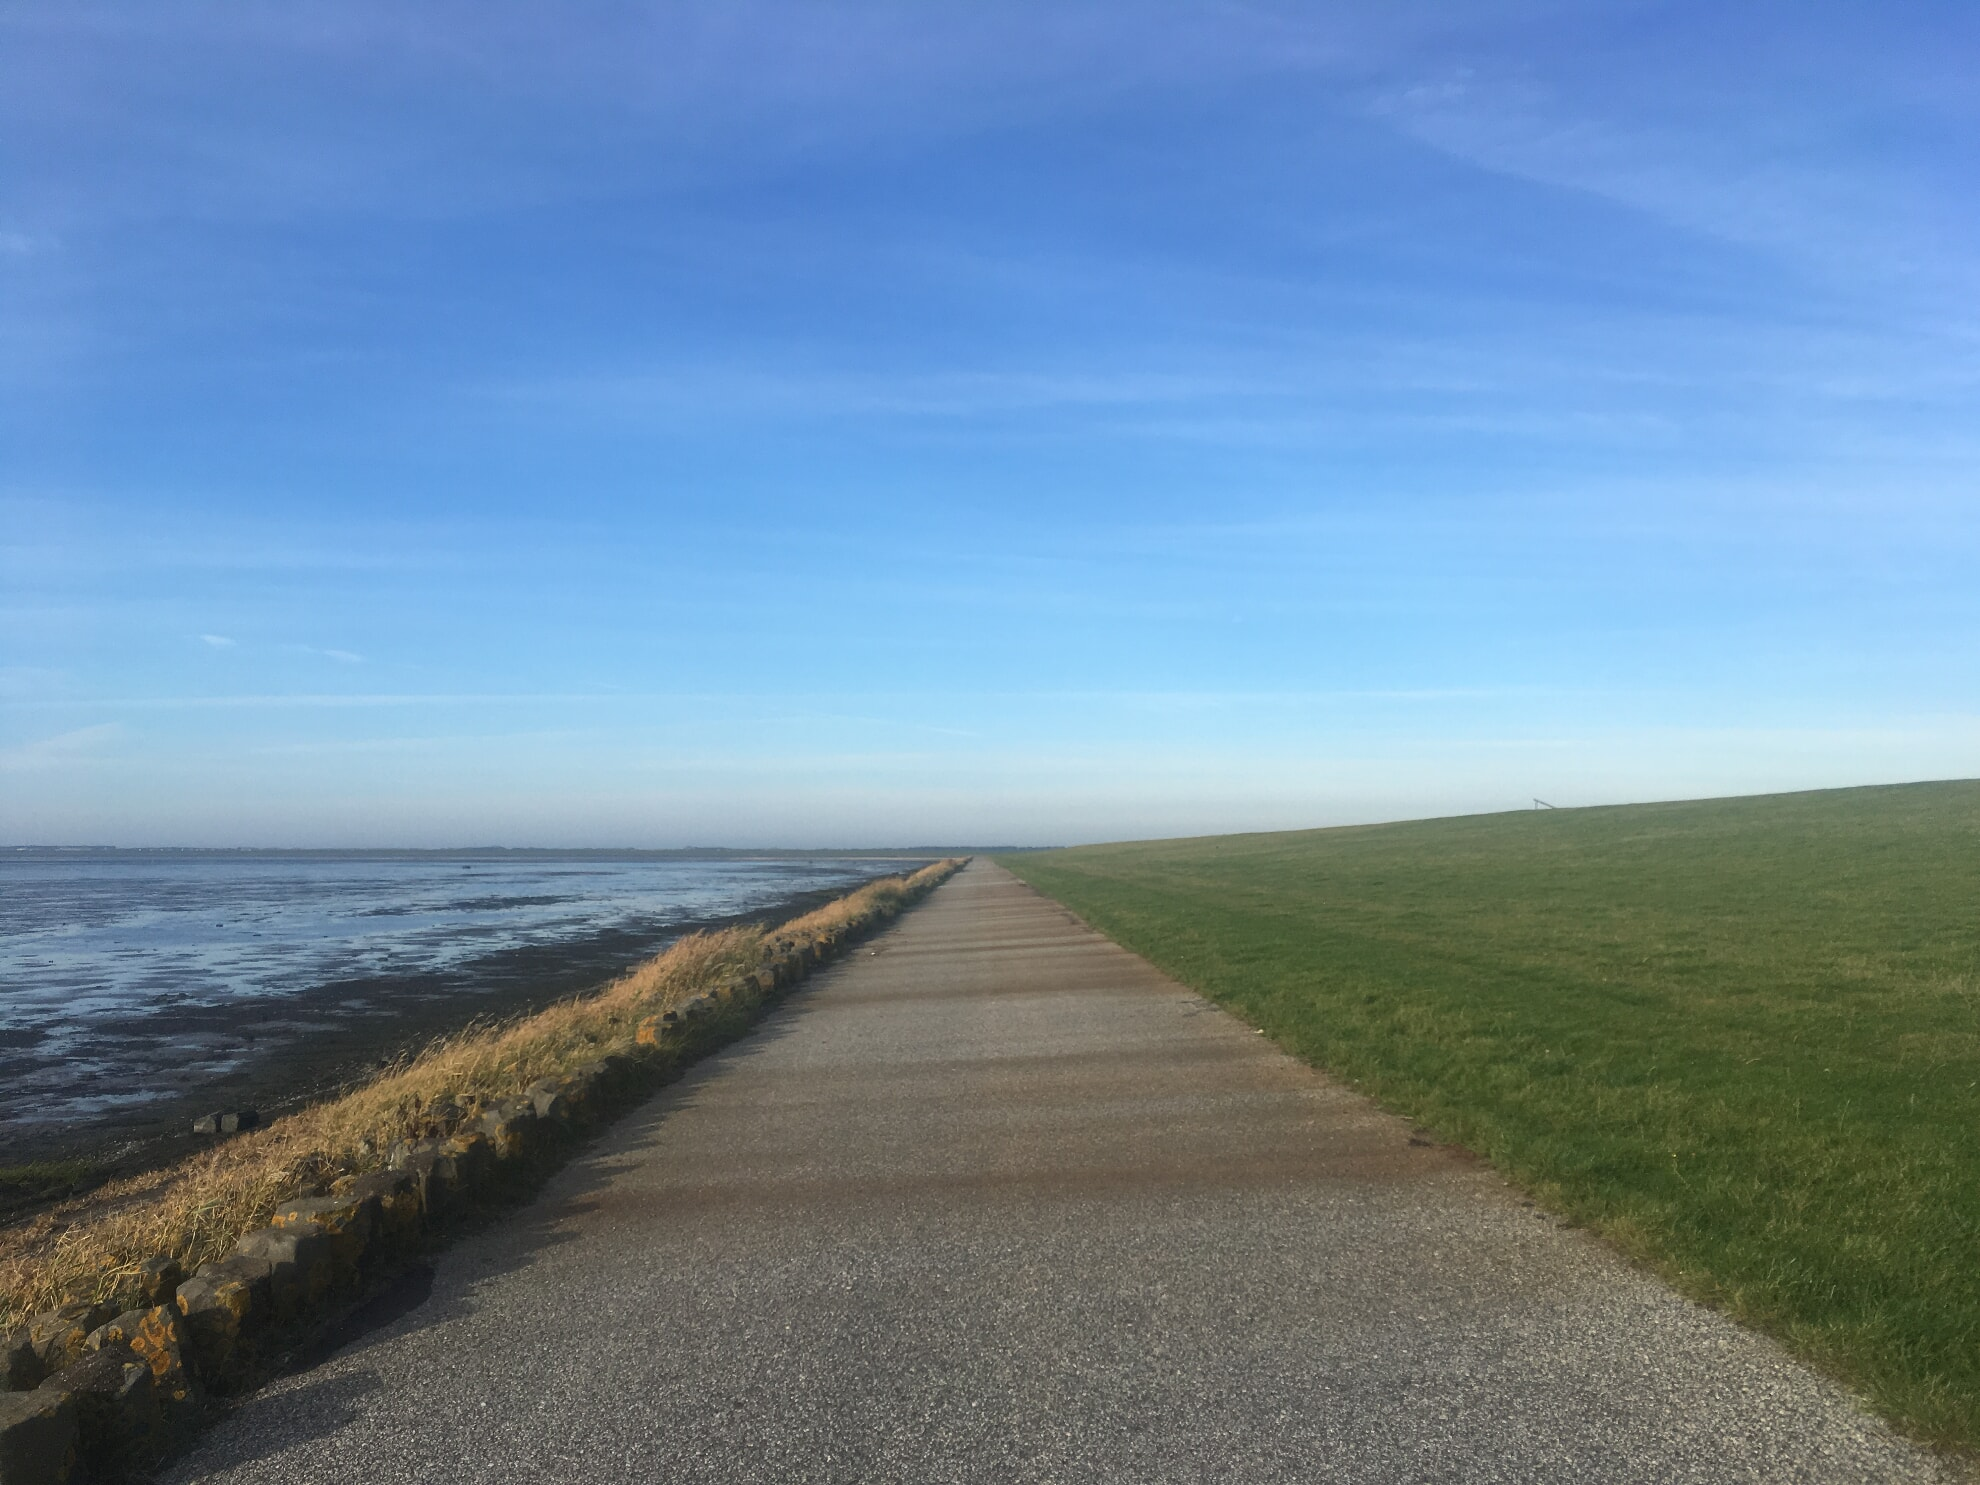 ebener gerader Weg am Wattenmeer